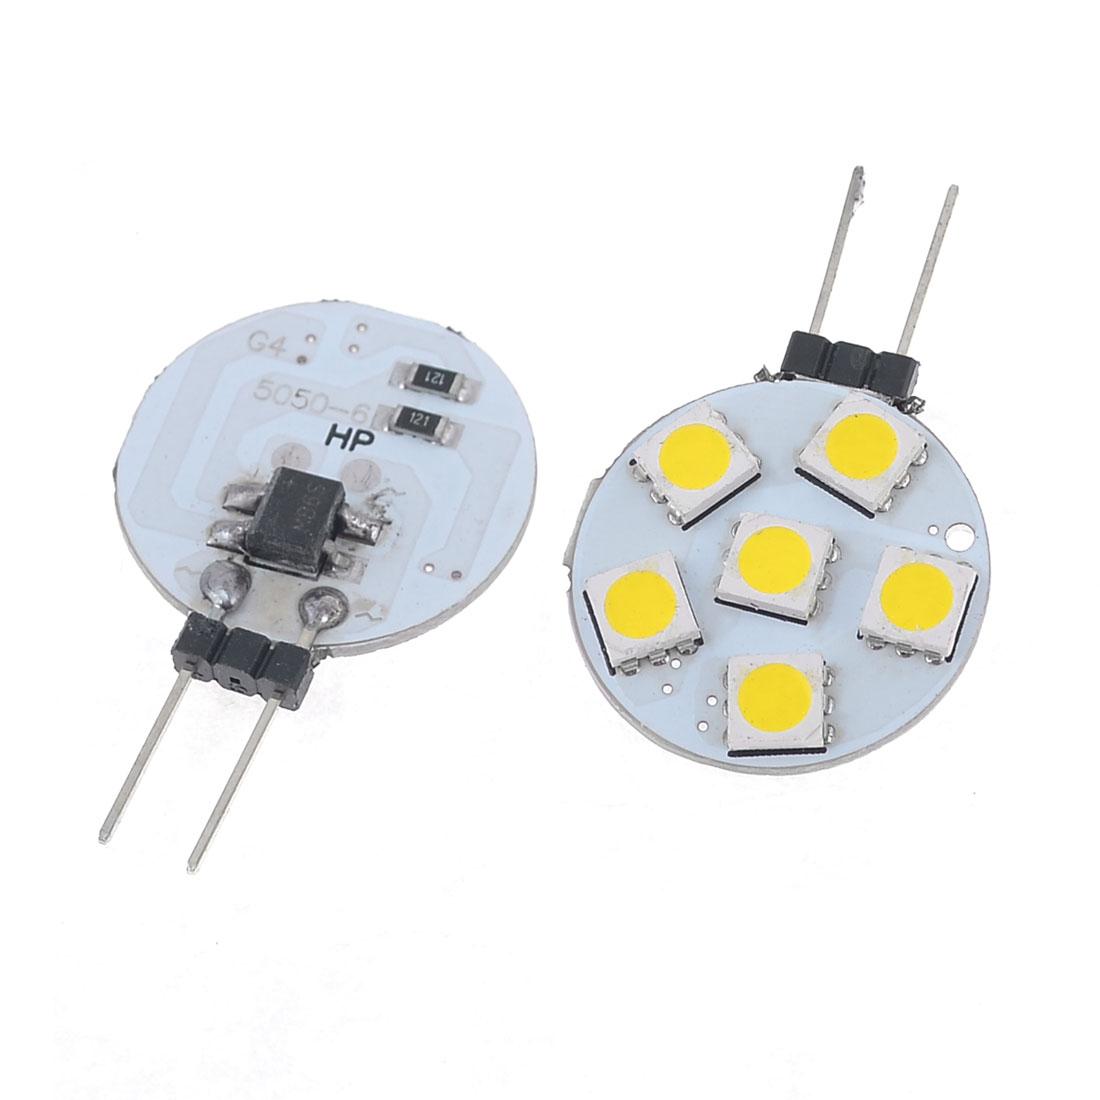 Pair Car Bin Pin Round G4 5050 SMD 5-LED Spot Light Bulb Warm White 12V